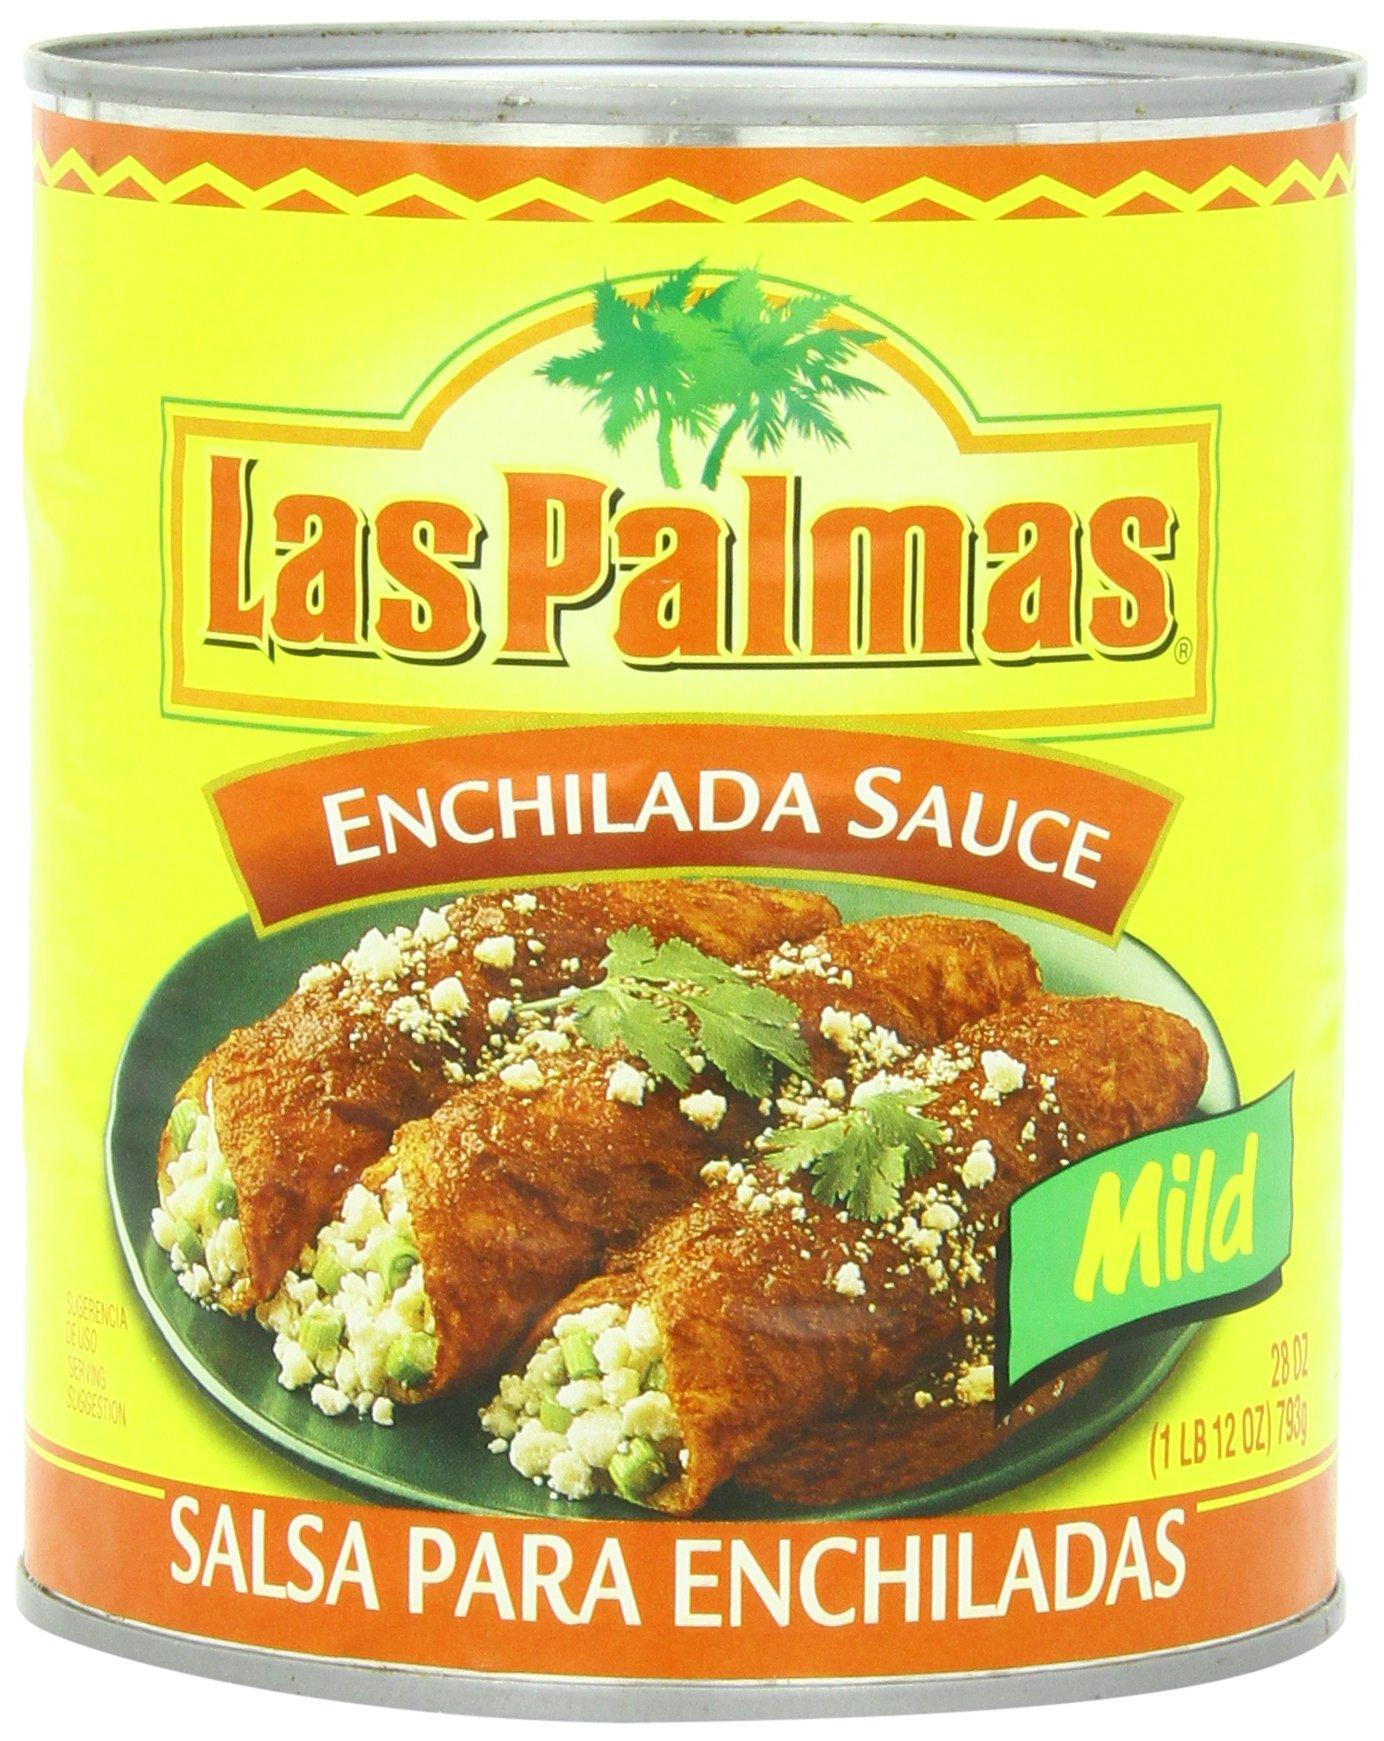 Las Palmas Enchilada Sauce, Mild, 28 Ounce (Pack of 12) by Las Palmas